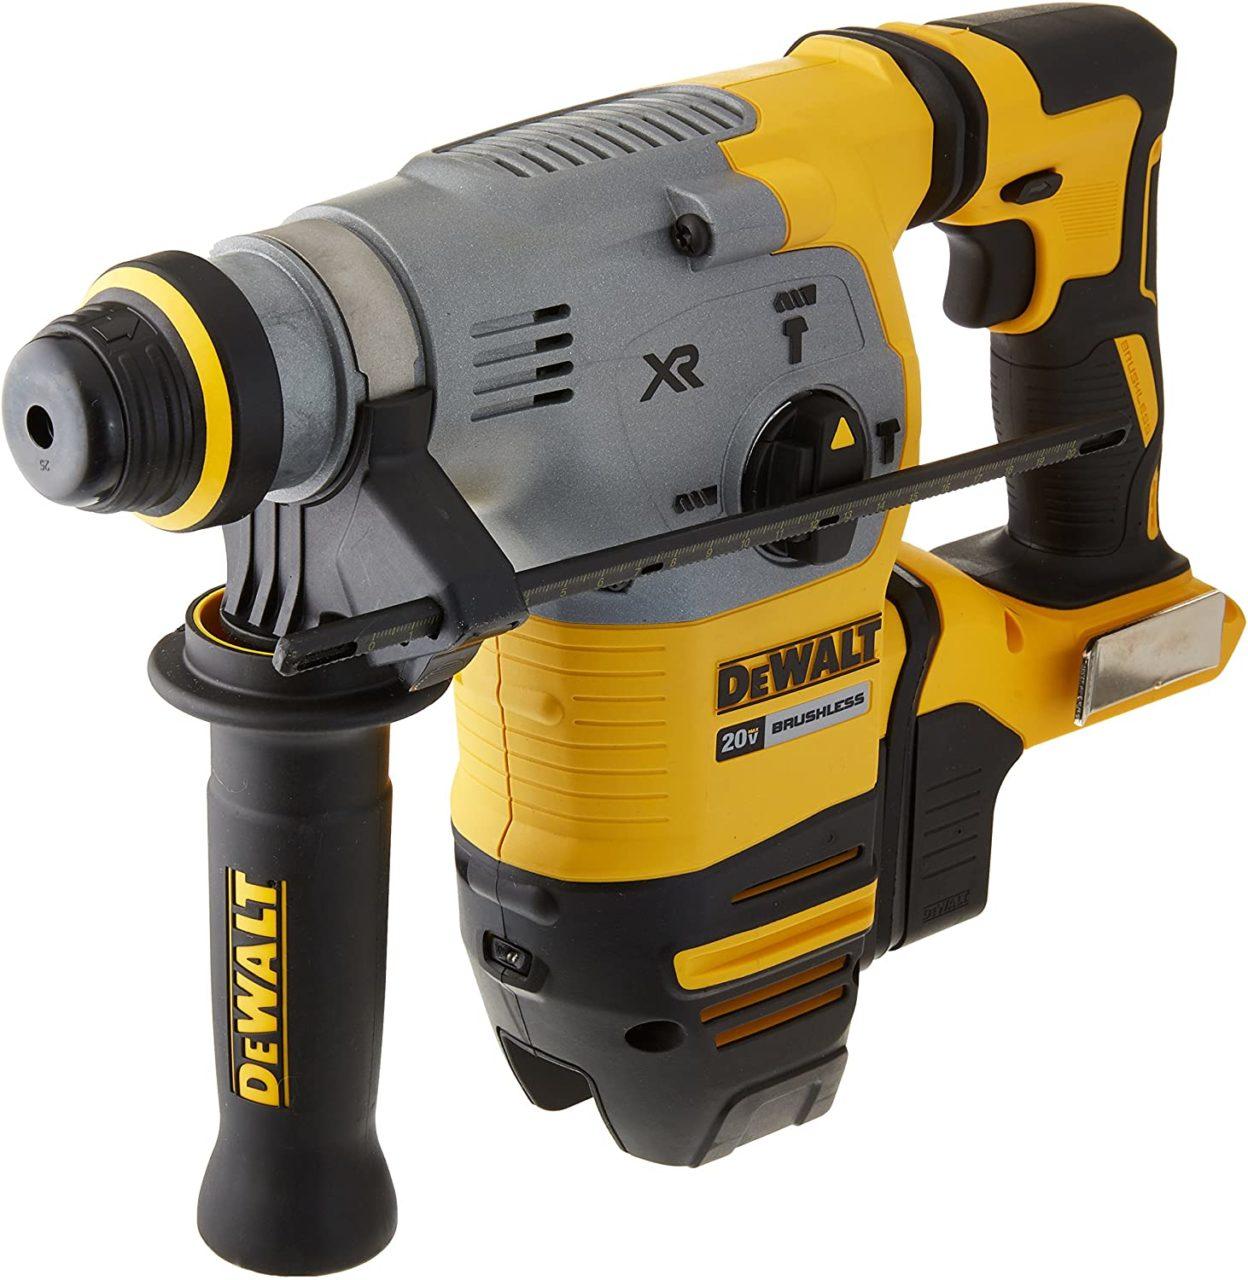 Best Rotary Hammer Drill for Concrete DeWALT DCH293B 20V MAX Rotary Hammer Drill